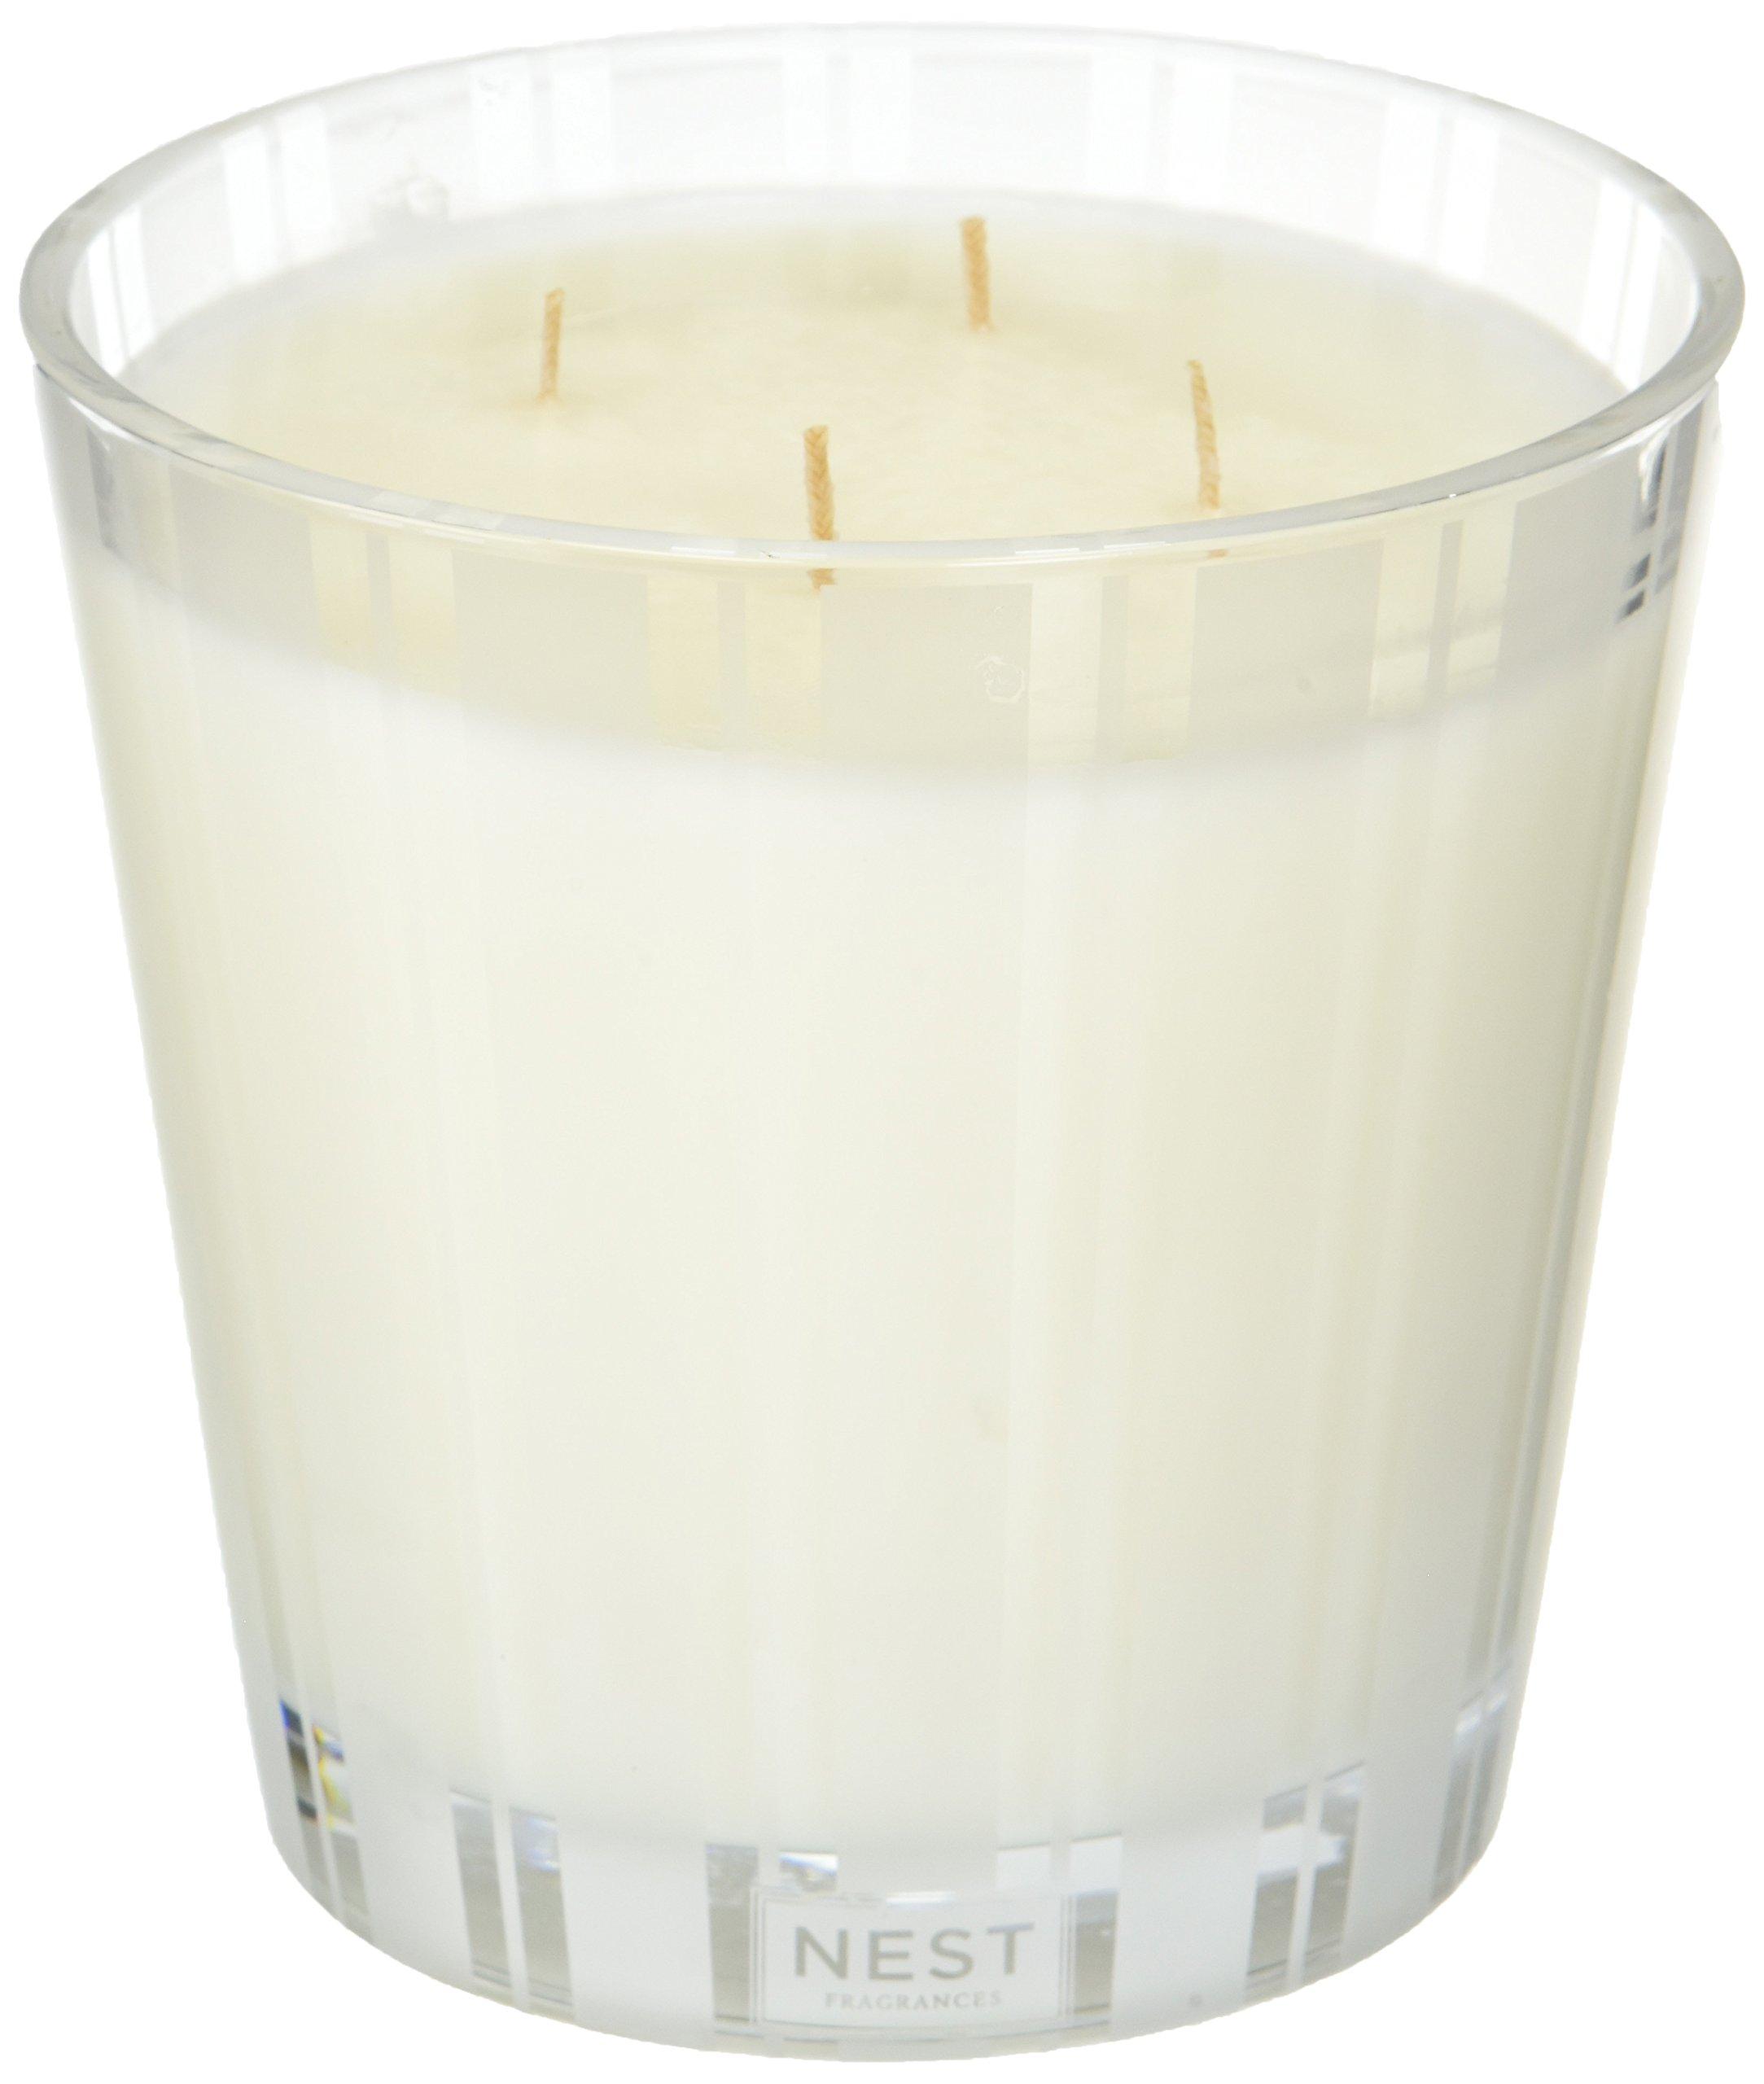 NEST Fragrances Sicilian Tangerine Luxury Candle by NEST Fragrances (Image #2)